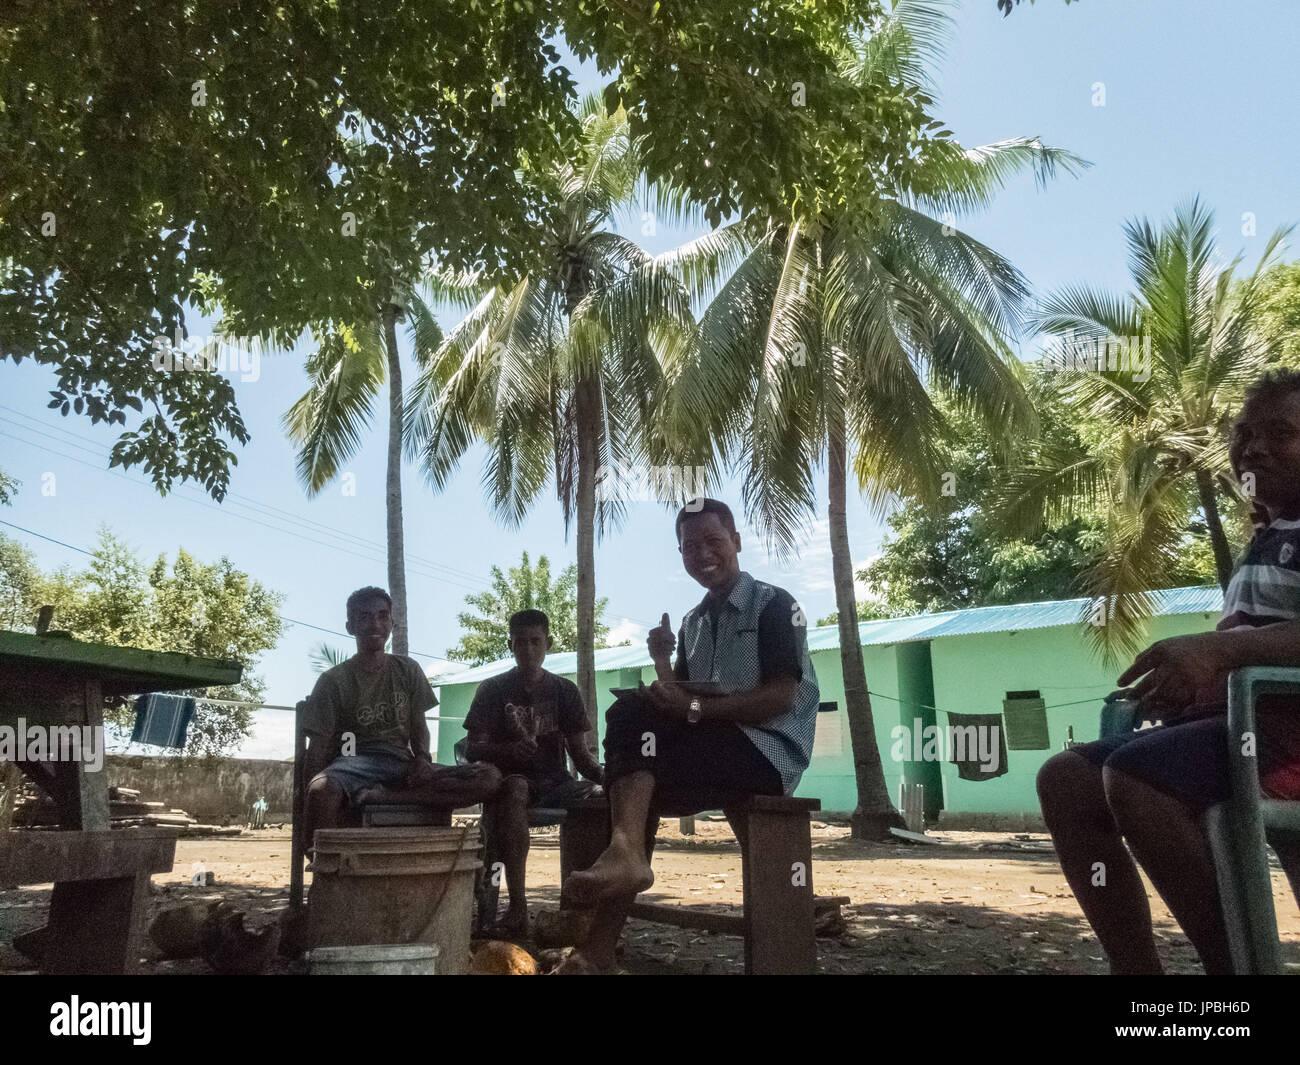 Teachers of primary school in Kampung Rinca sitting in the shadow, people, men, man, photojournalism - Stock Image